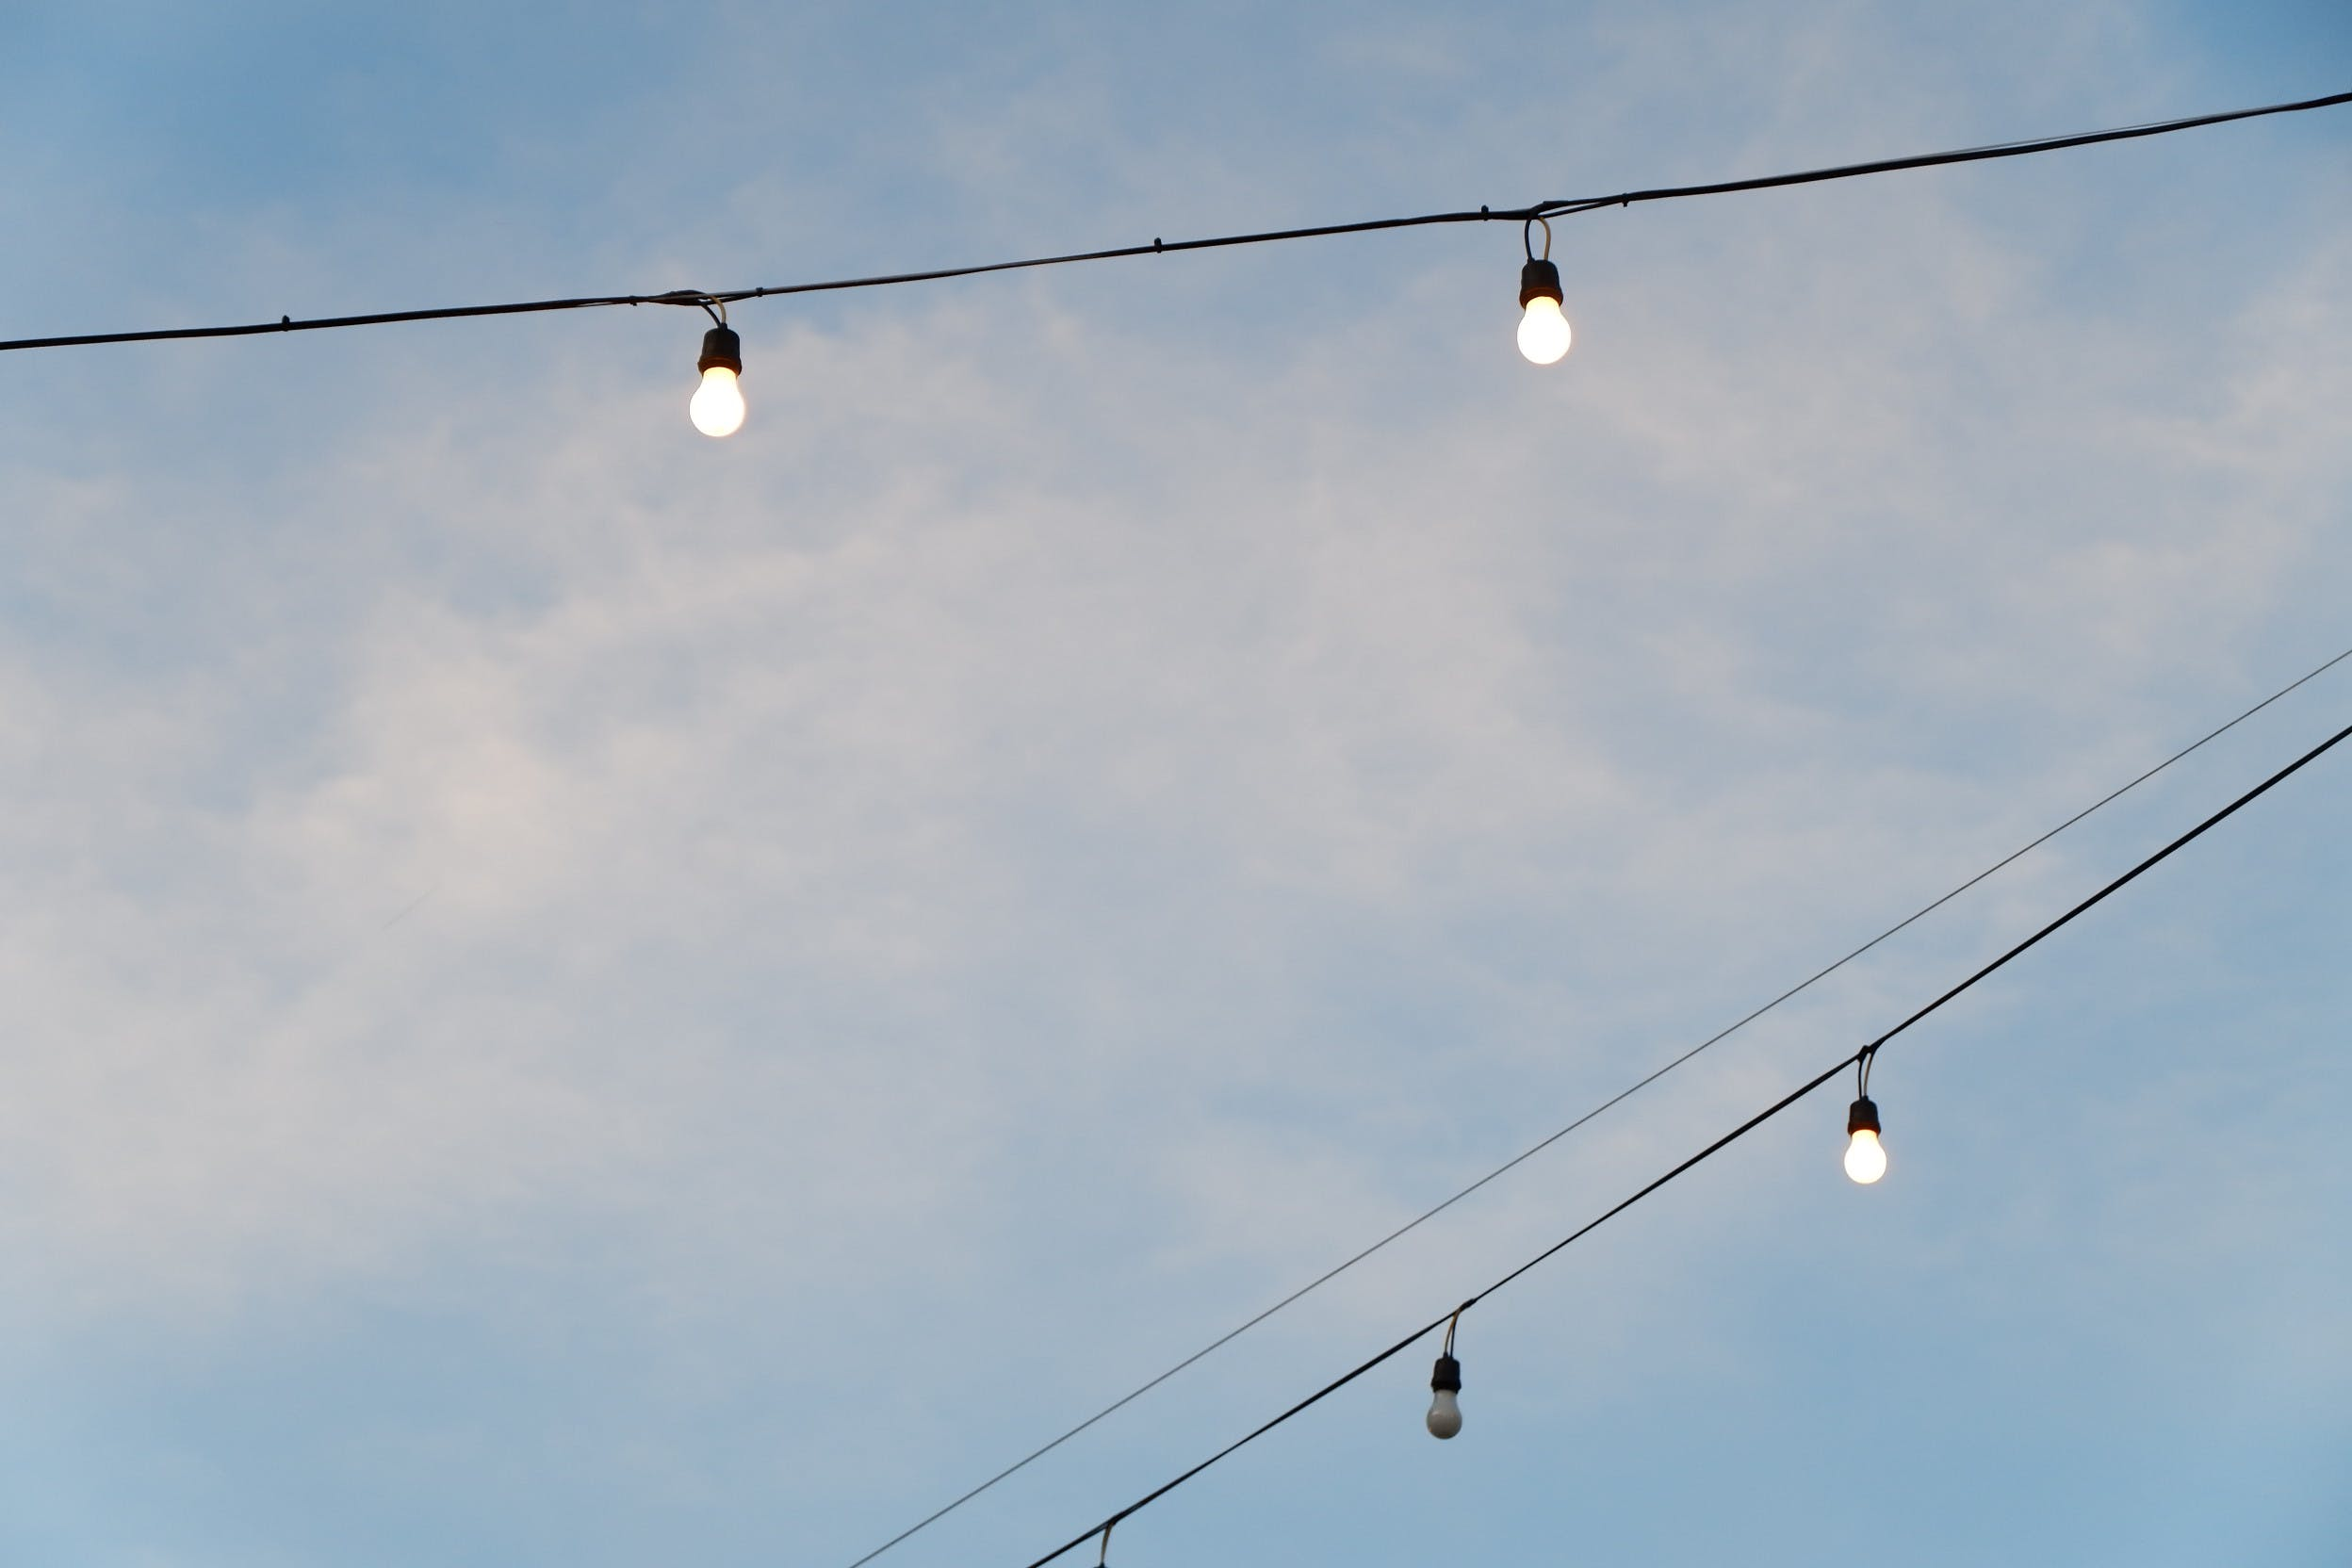 Free stock photo of light, sun, high, freedom